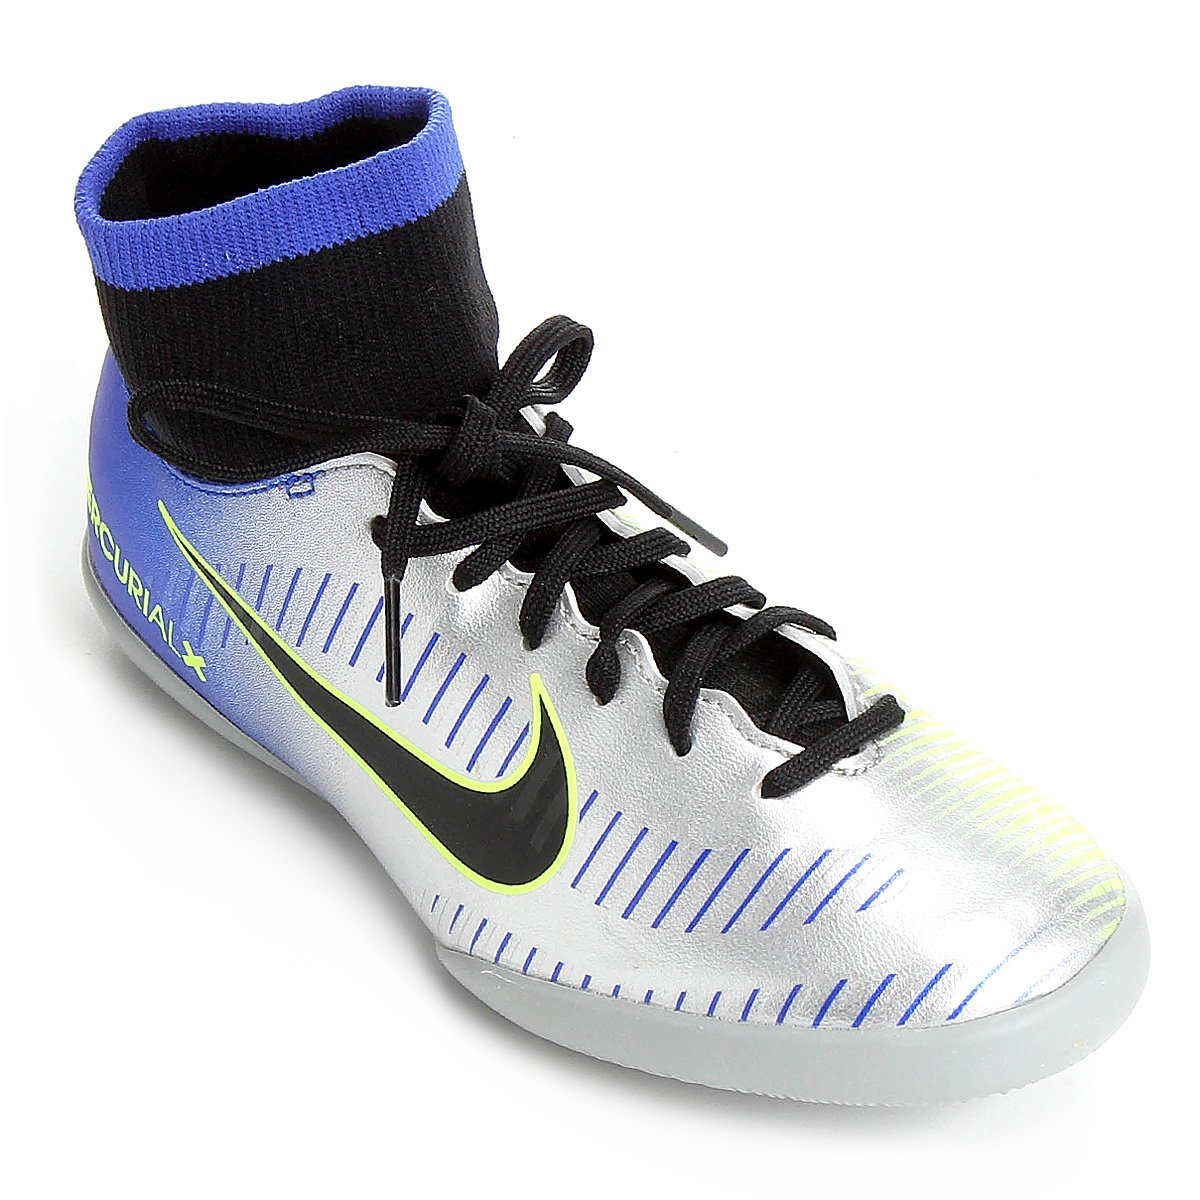 3d64a4d4cd Chuteira Futsal Infantil Nike Mercurial Victory 6 DF Neymar Jr IC - Compre  Agora